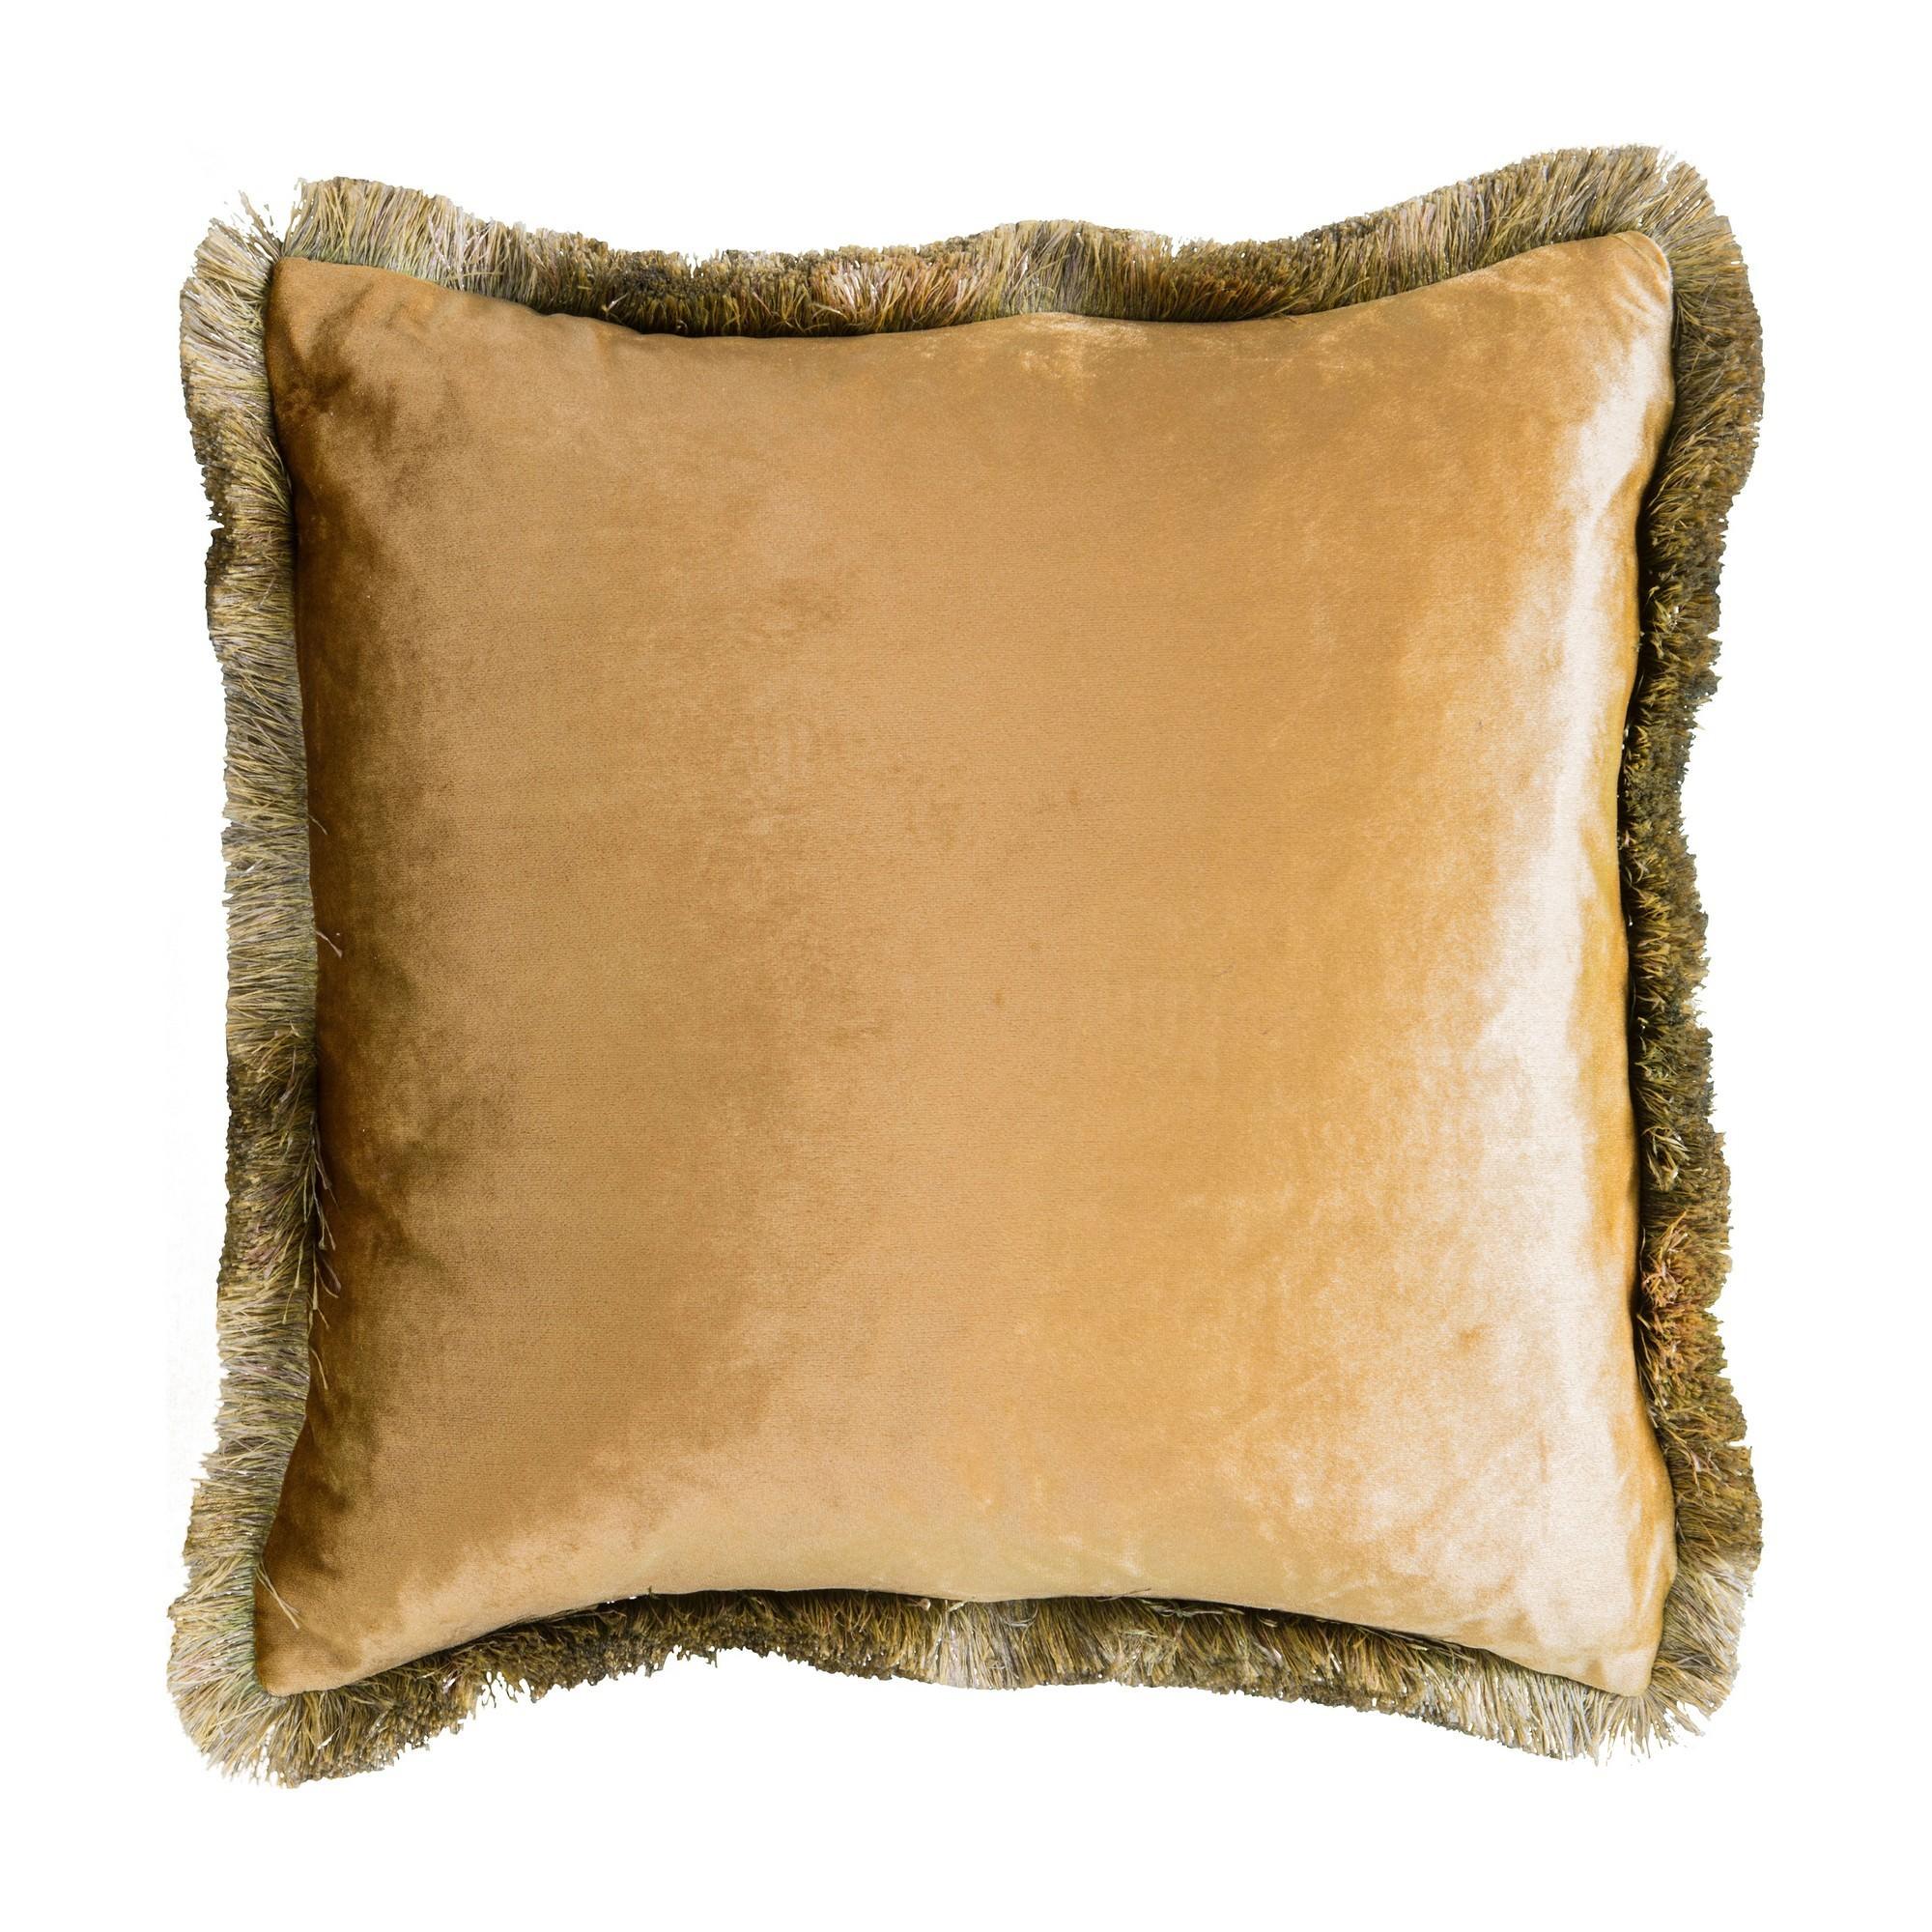 Orella Velvet Fabric Feather Filled Scatter Cushion, Ochre